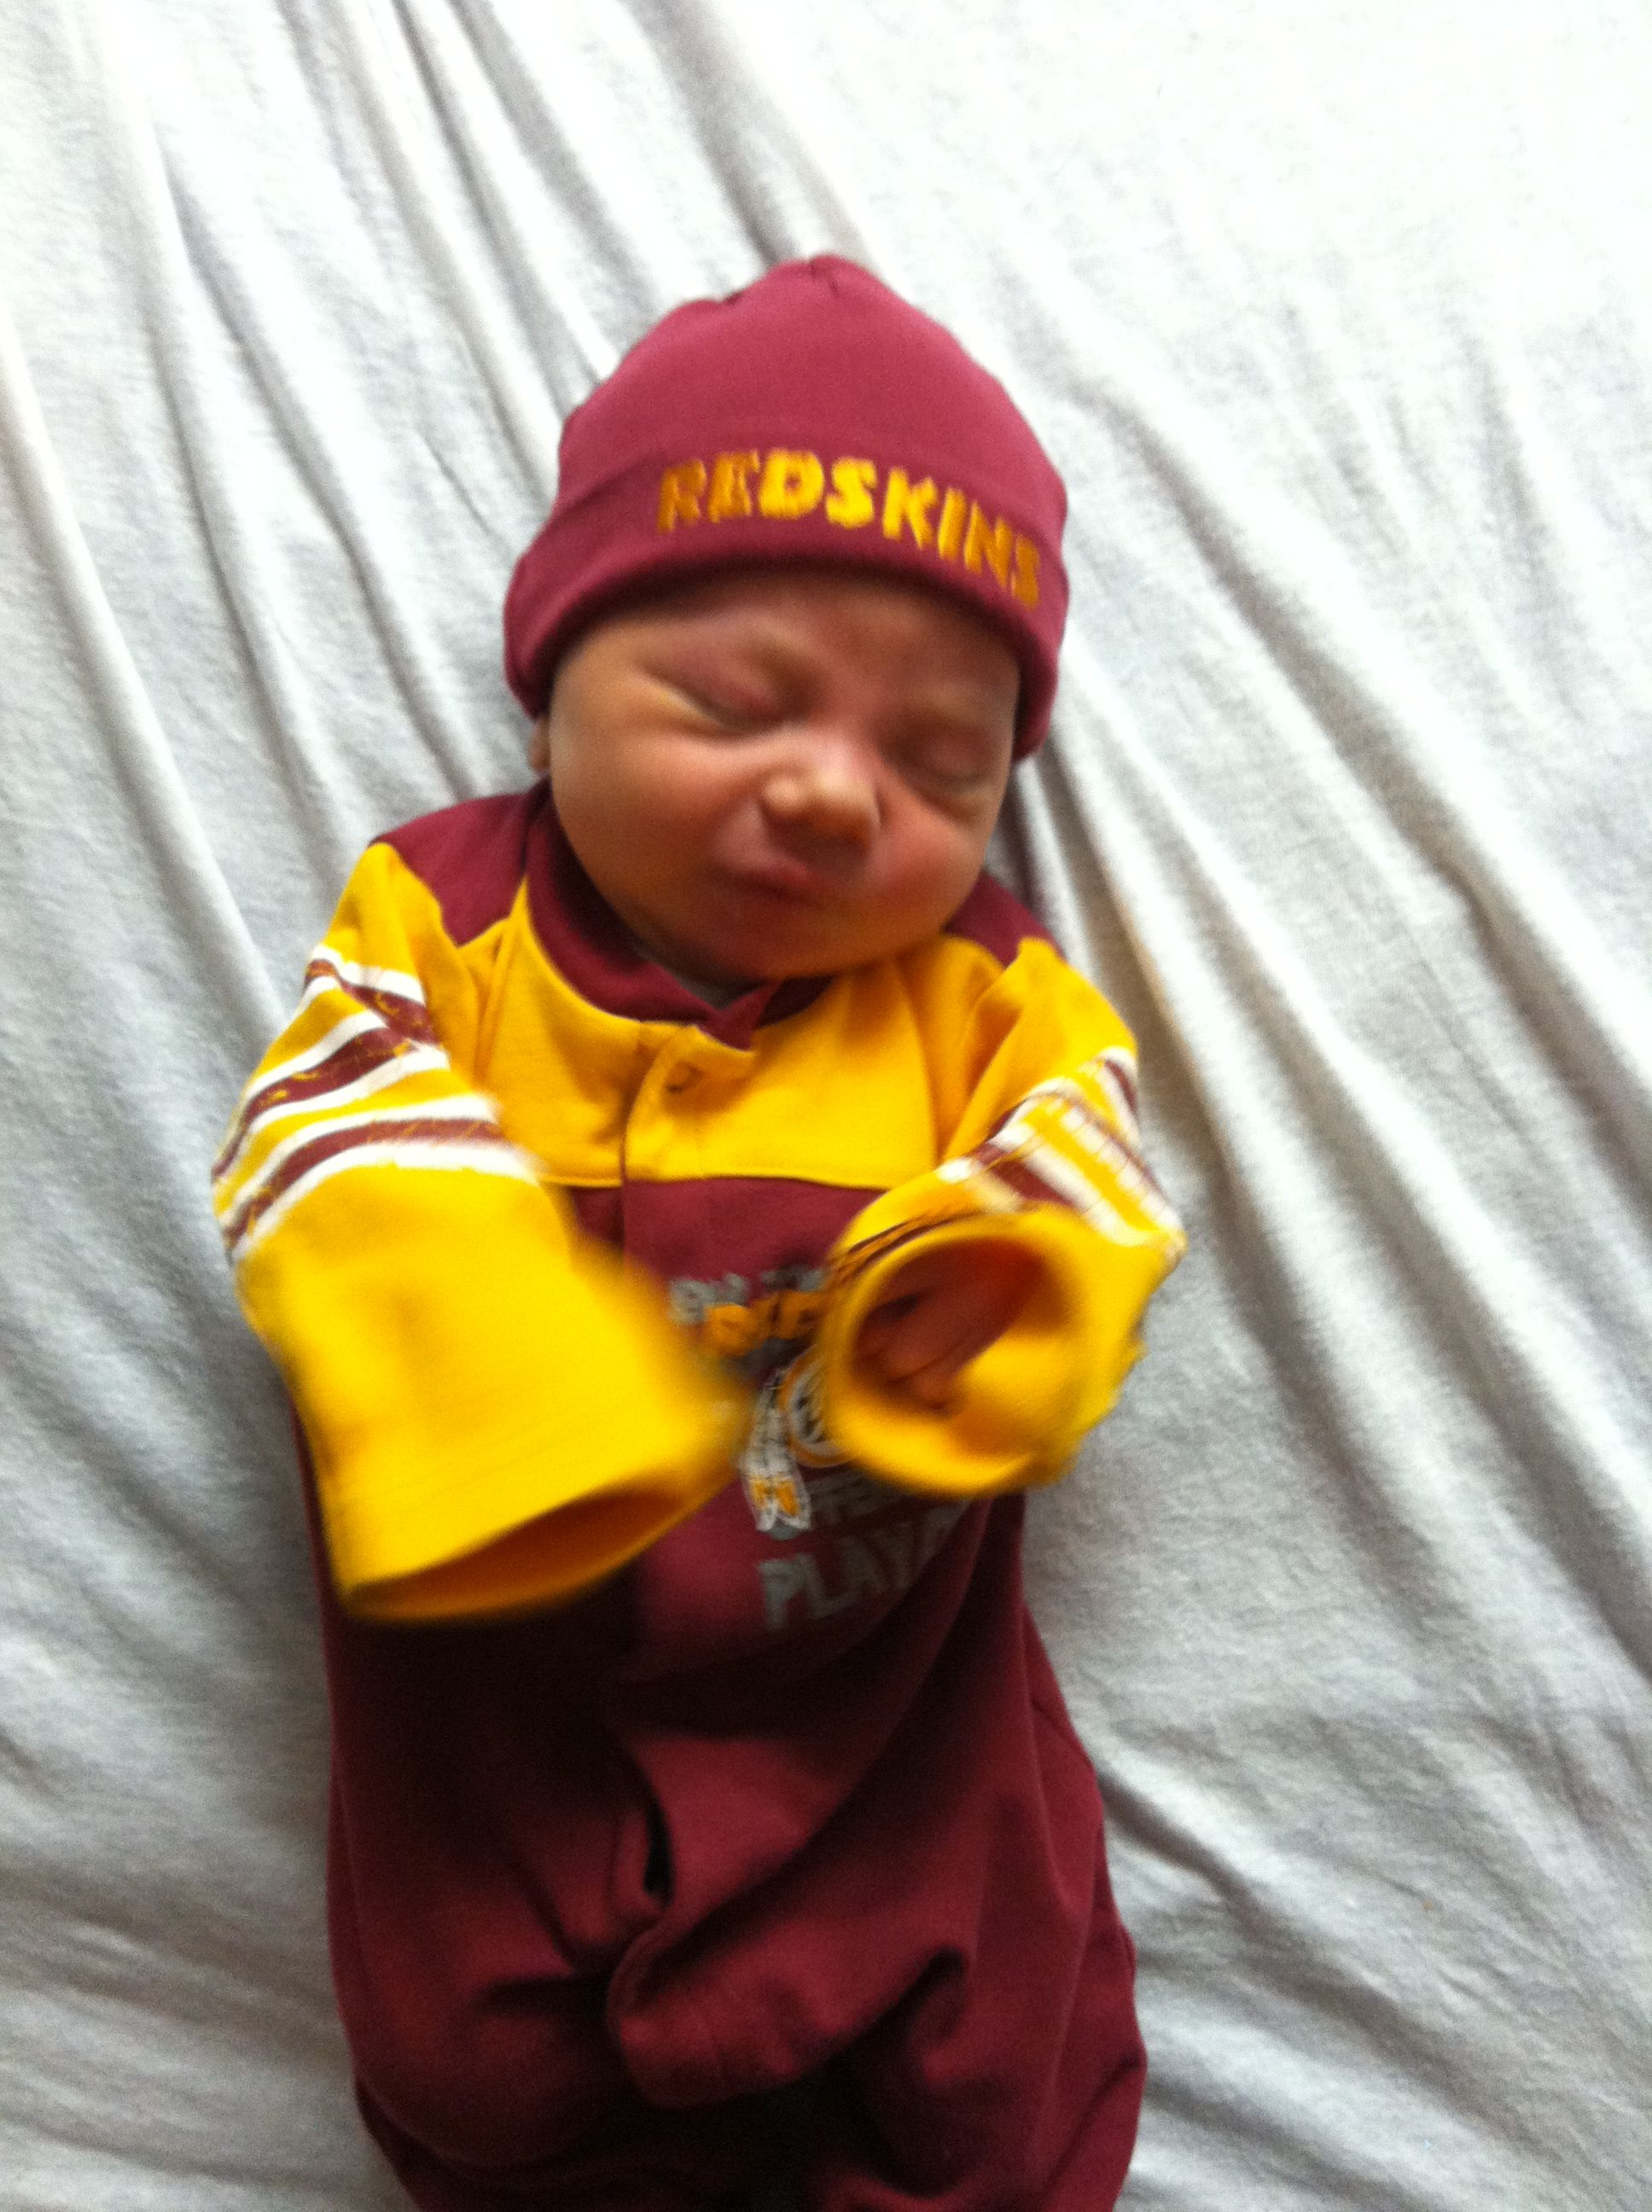 Redskins baby 3 days old 9f3a91c4f